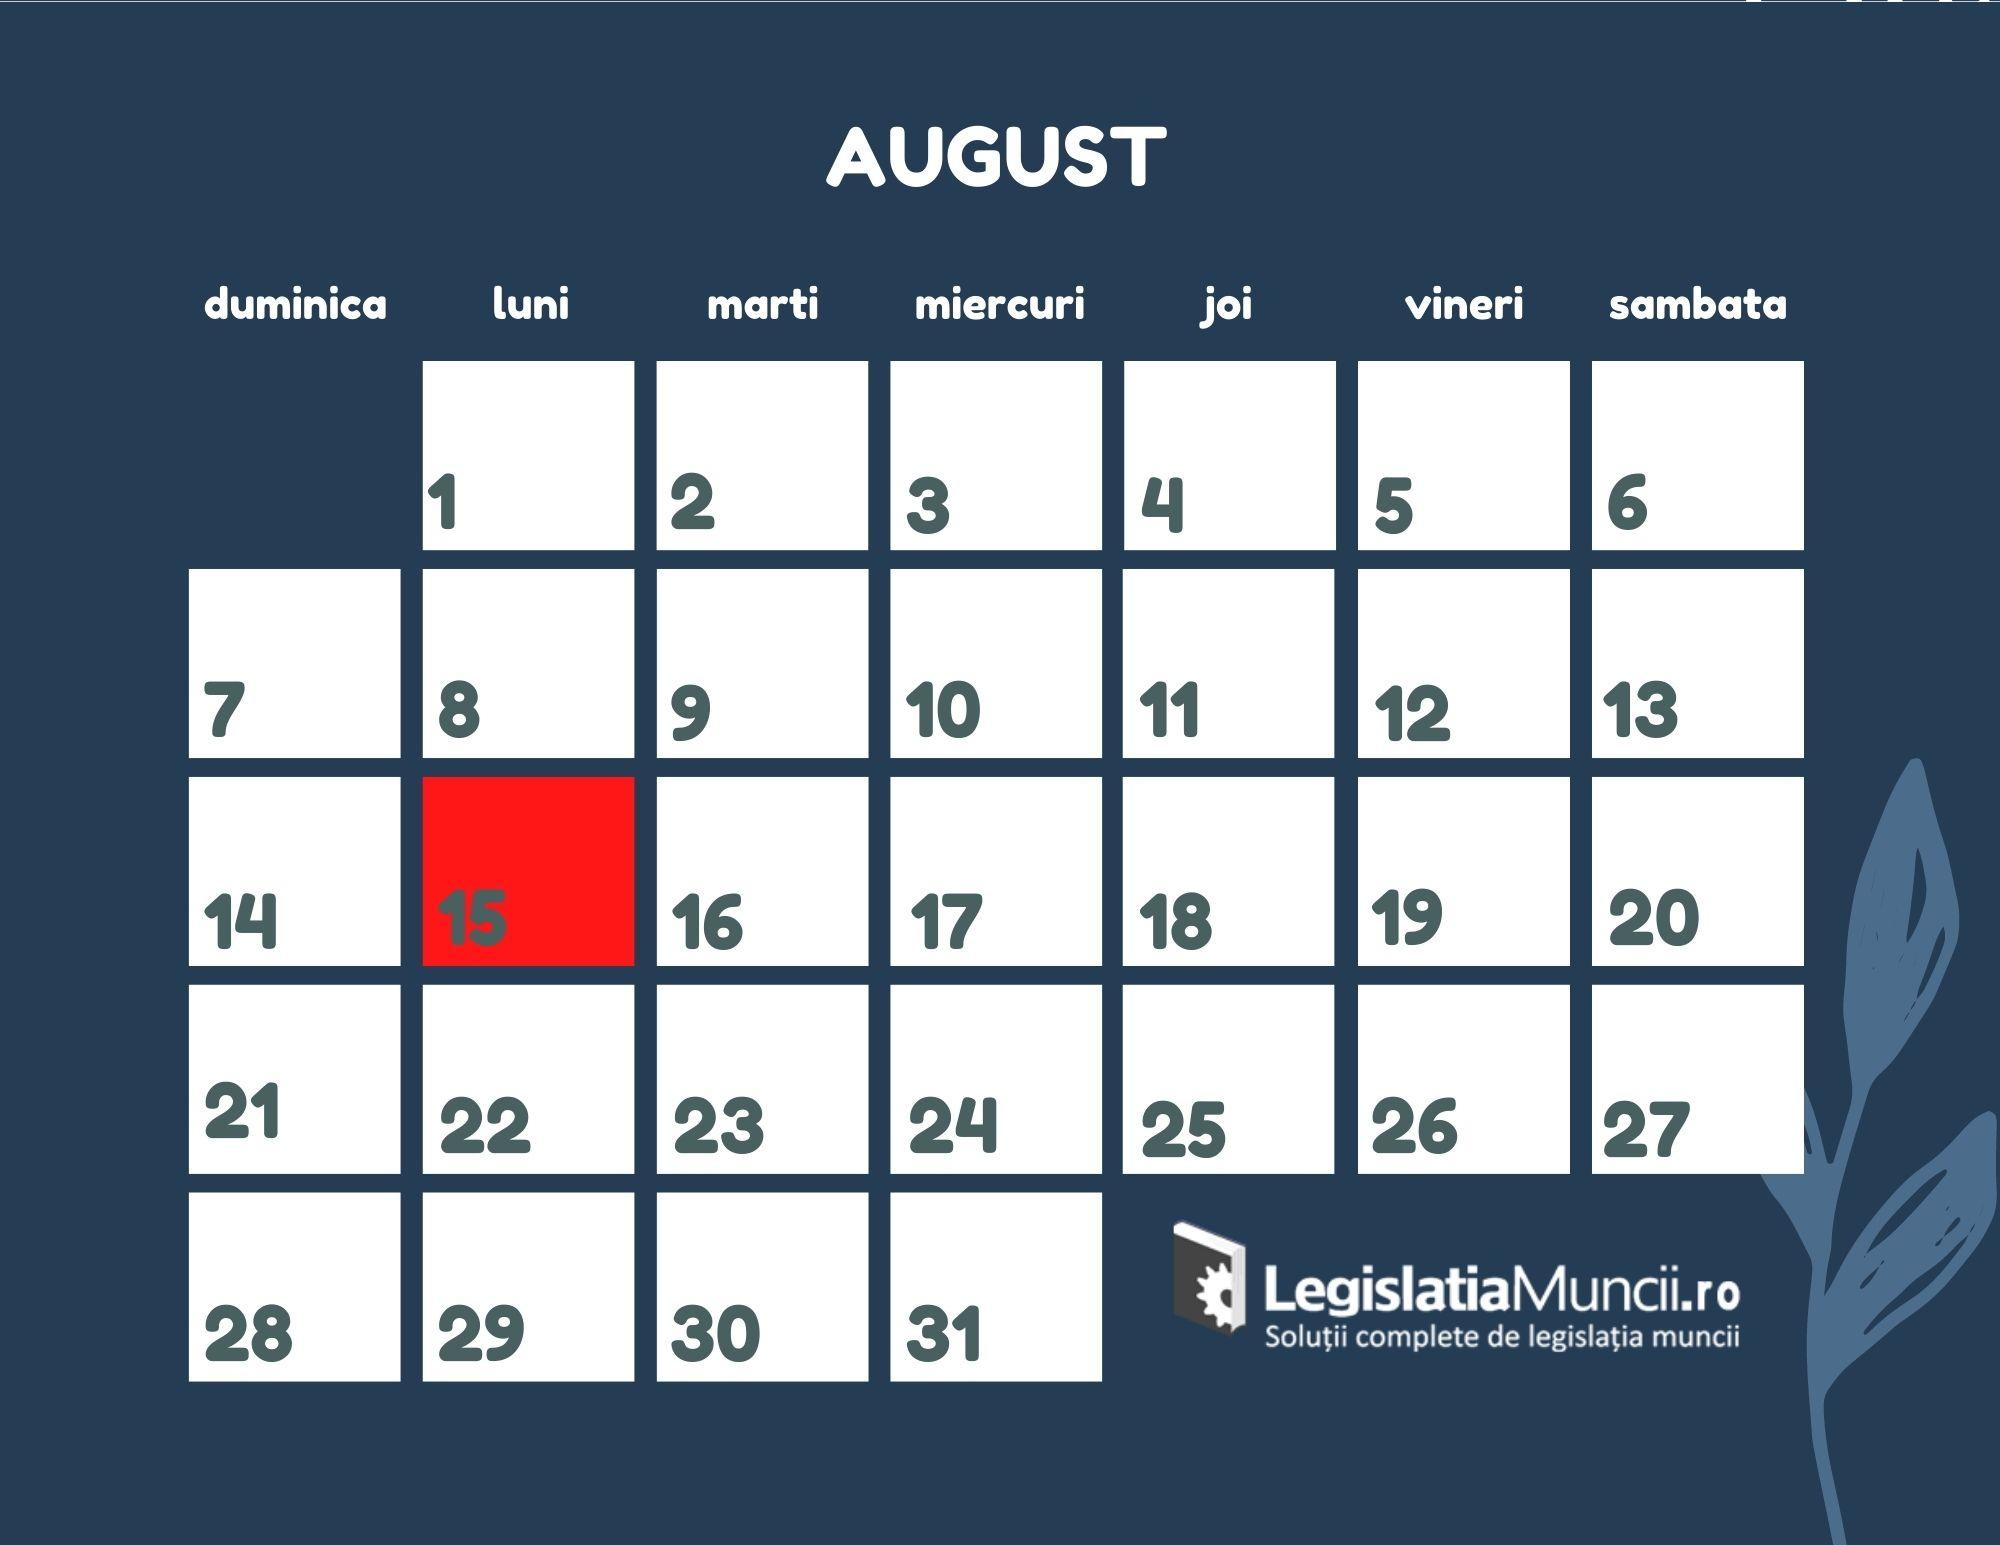 Libere legale August 2022